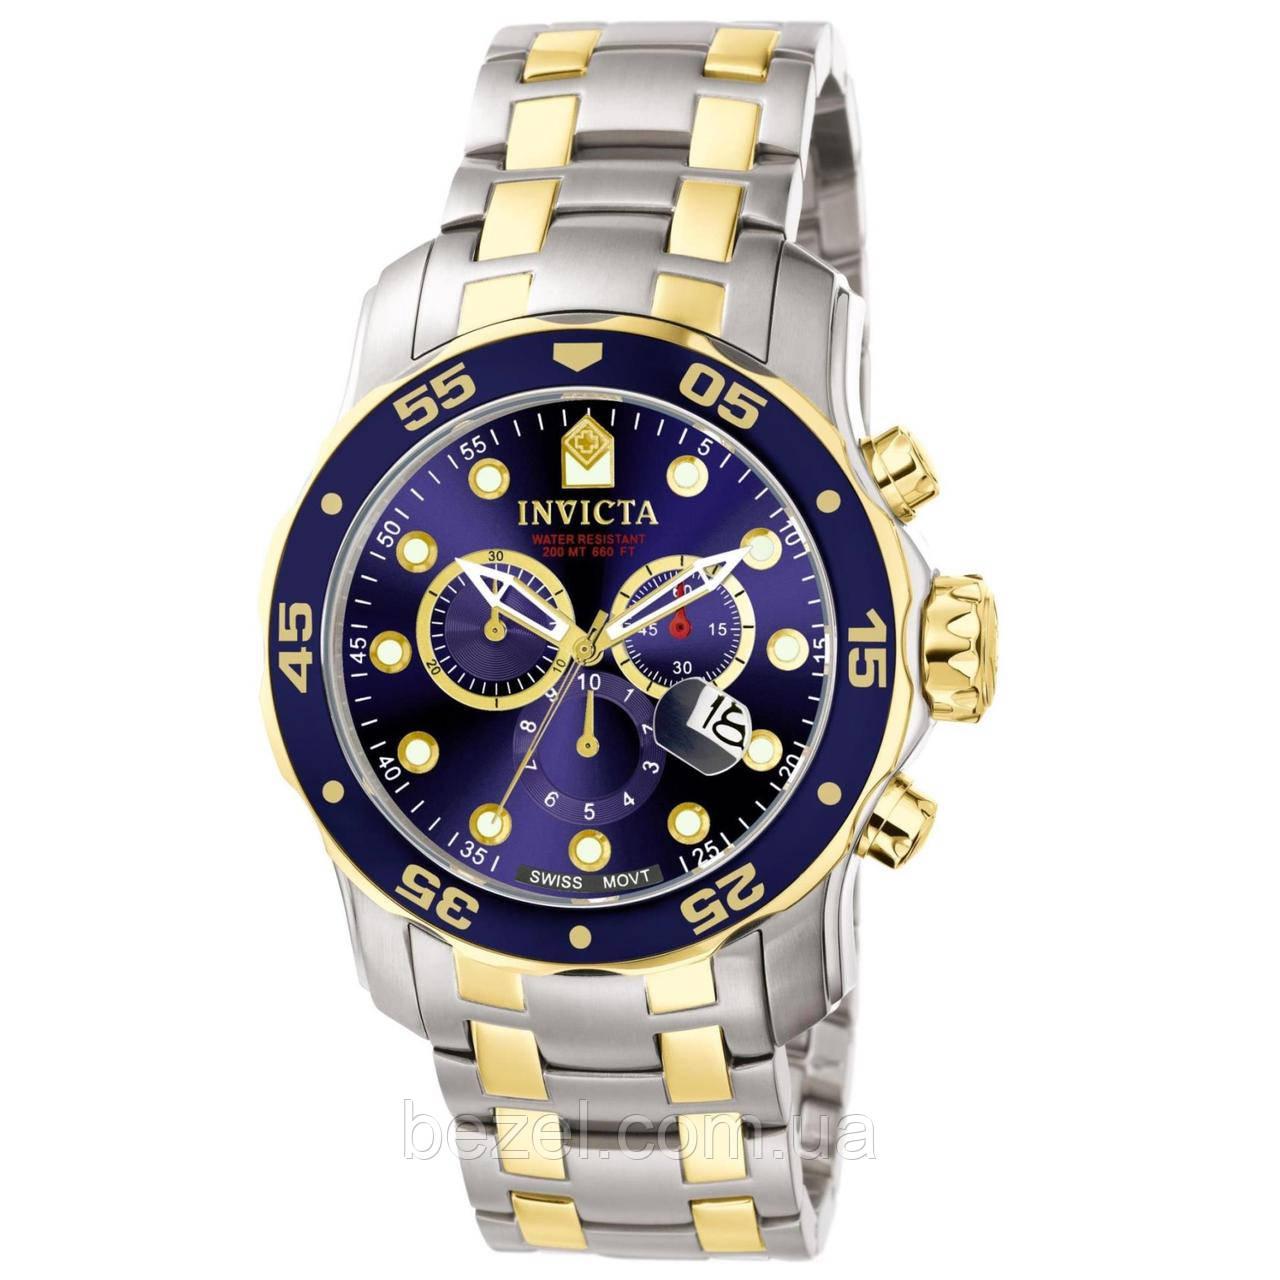 Швейцарские мужские наручные часы